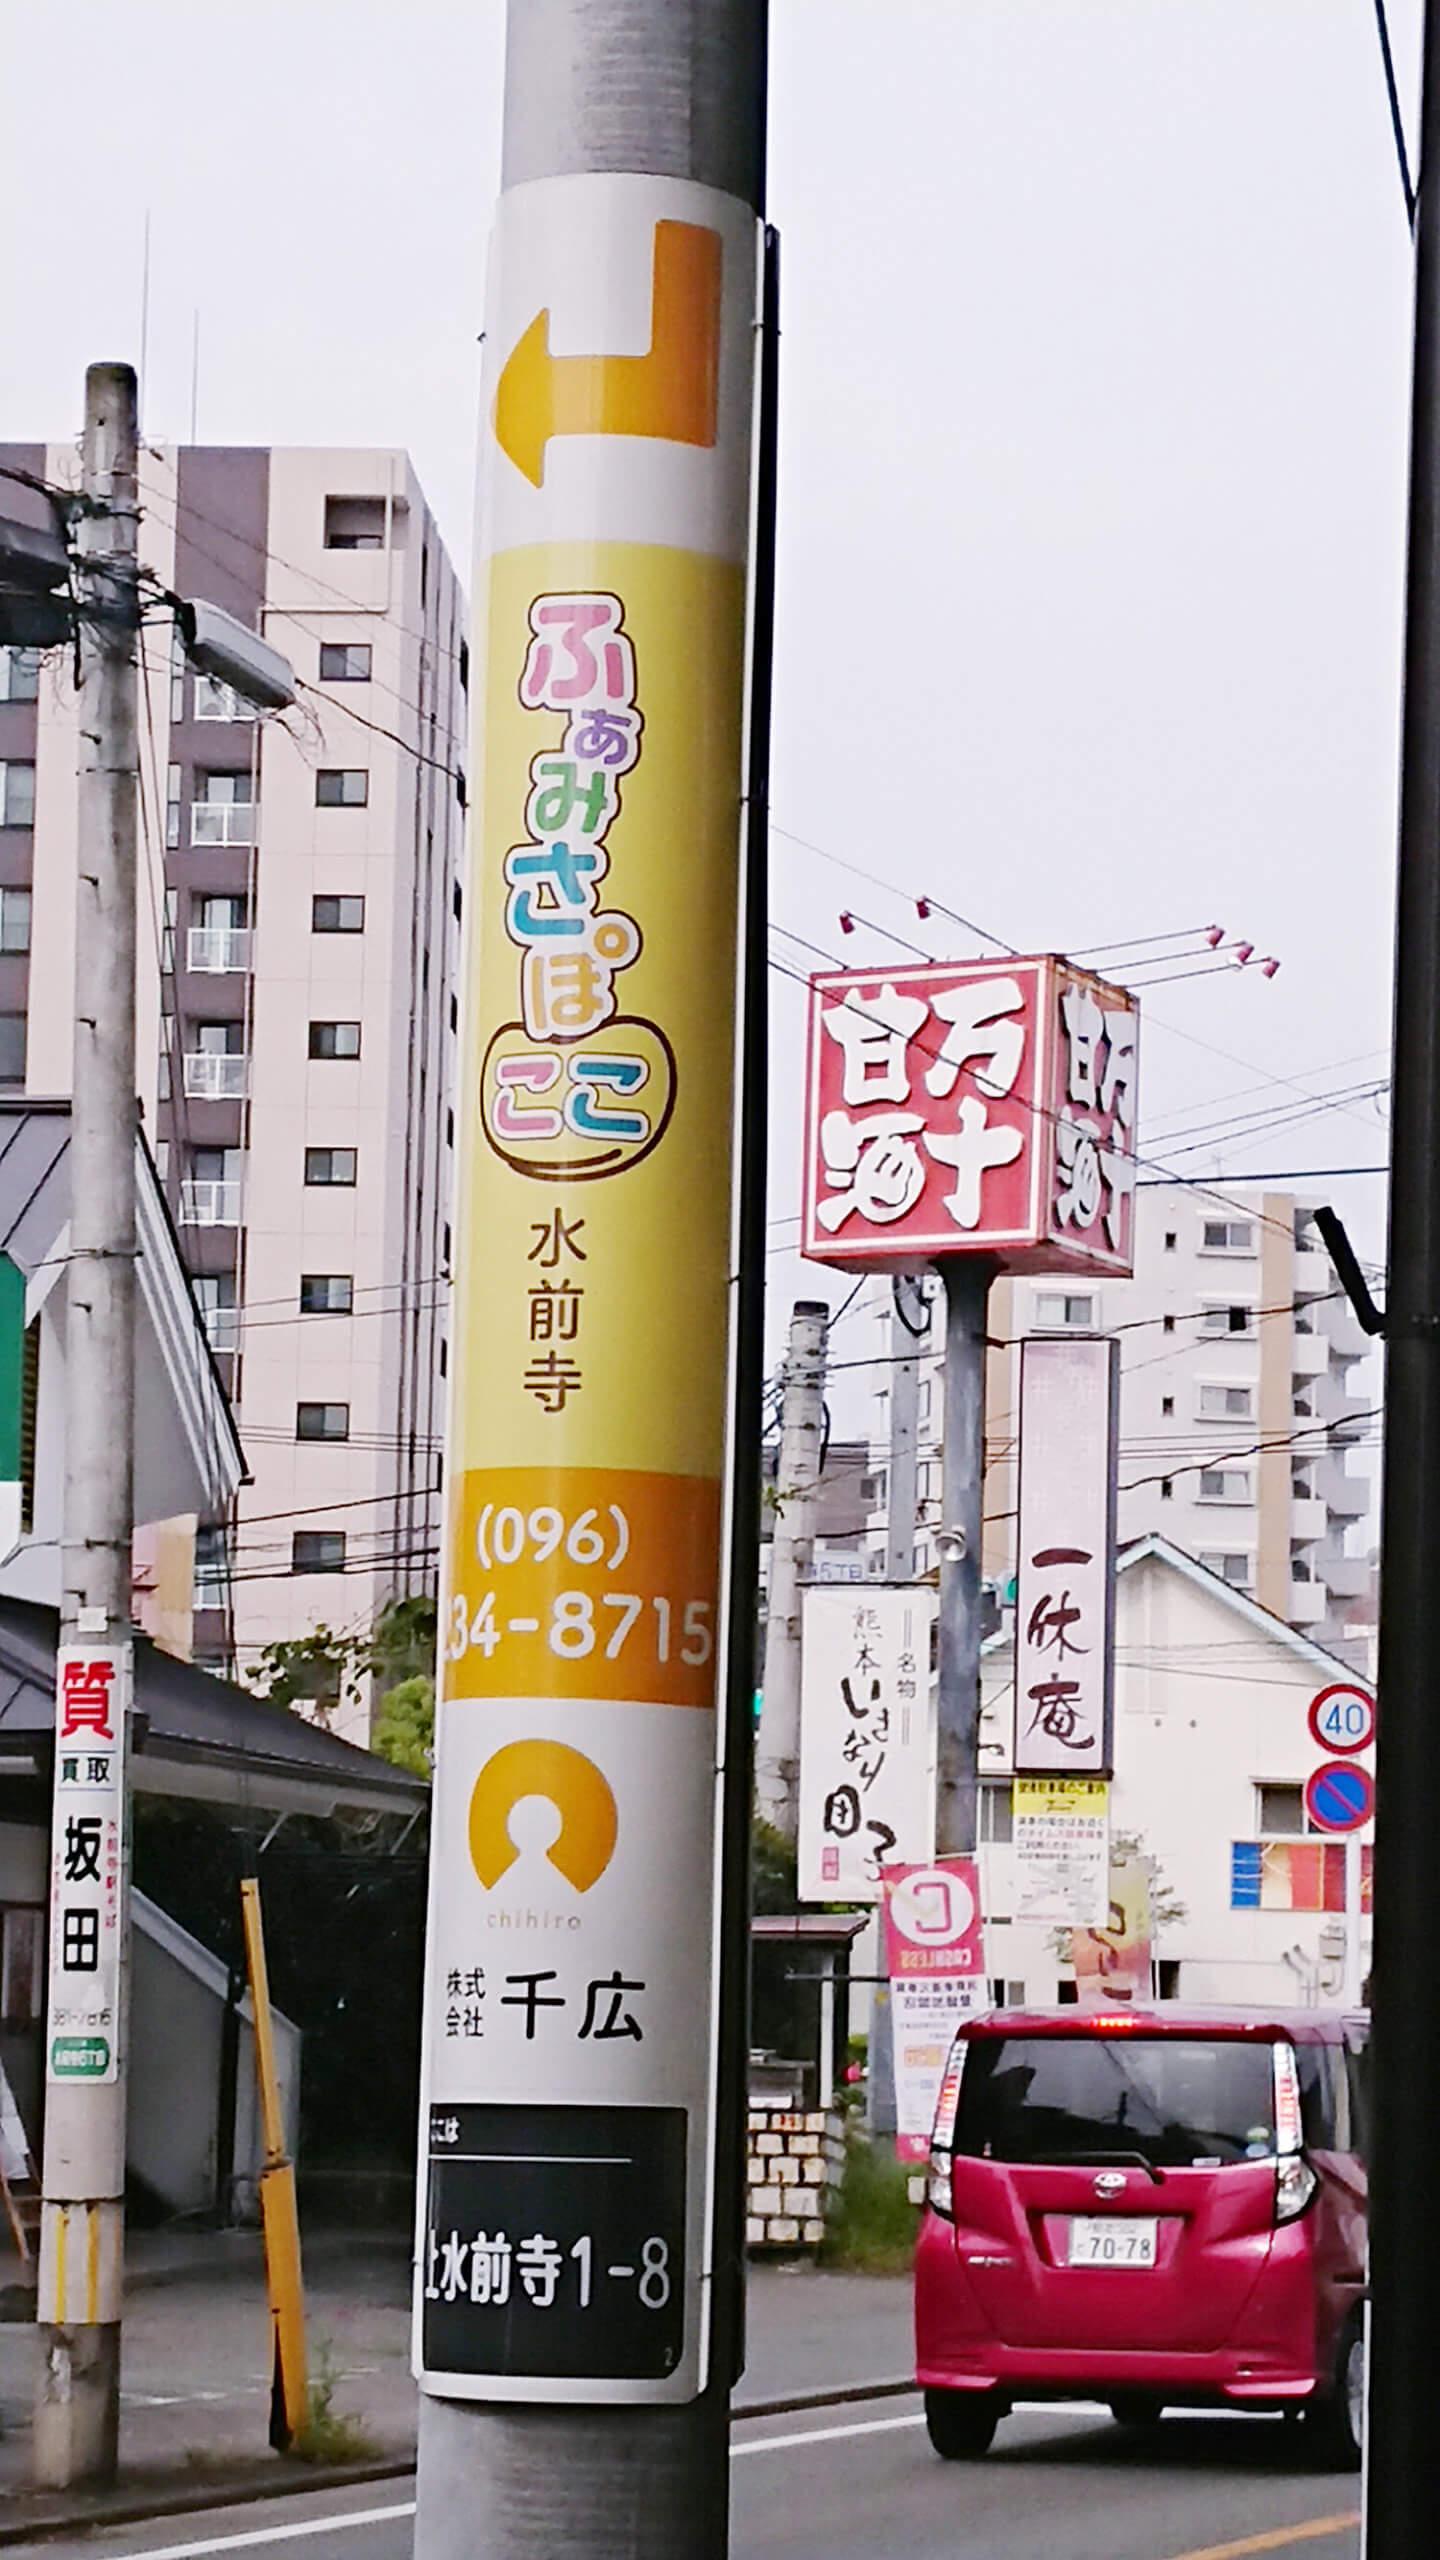 事業所の電柱広告